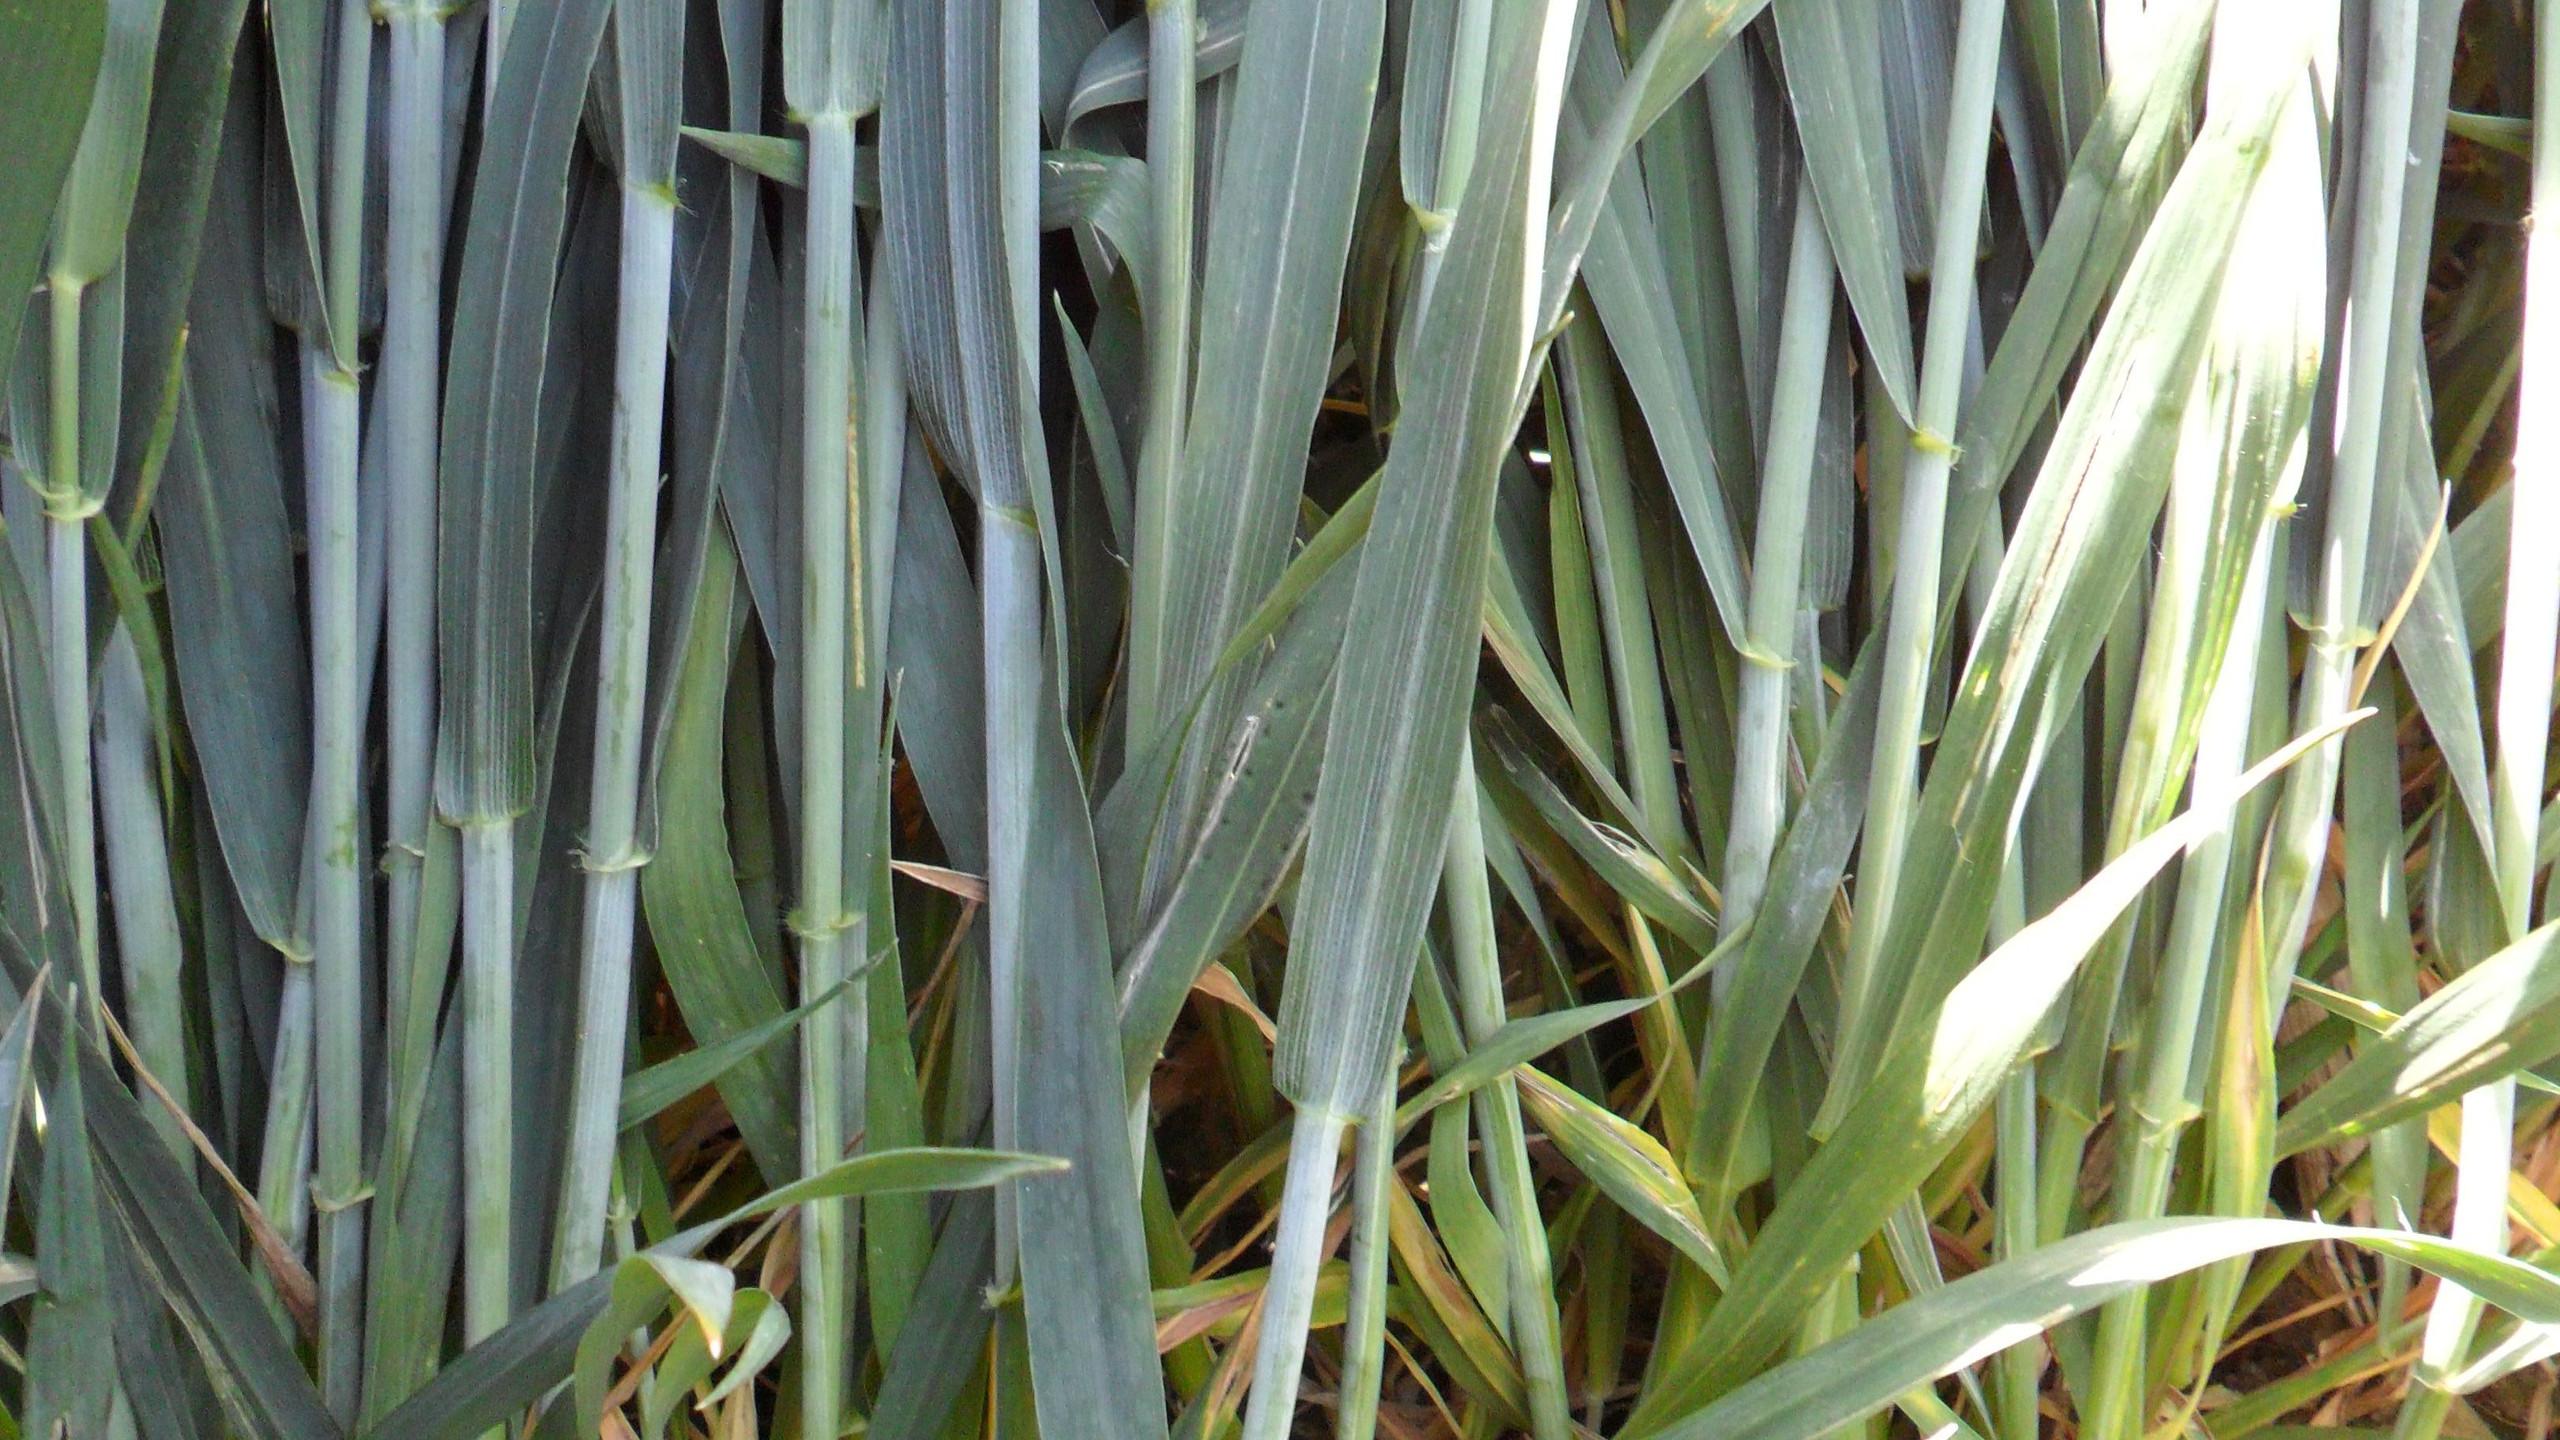 Healthy Wheat Disease Free